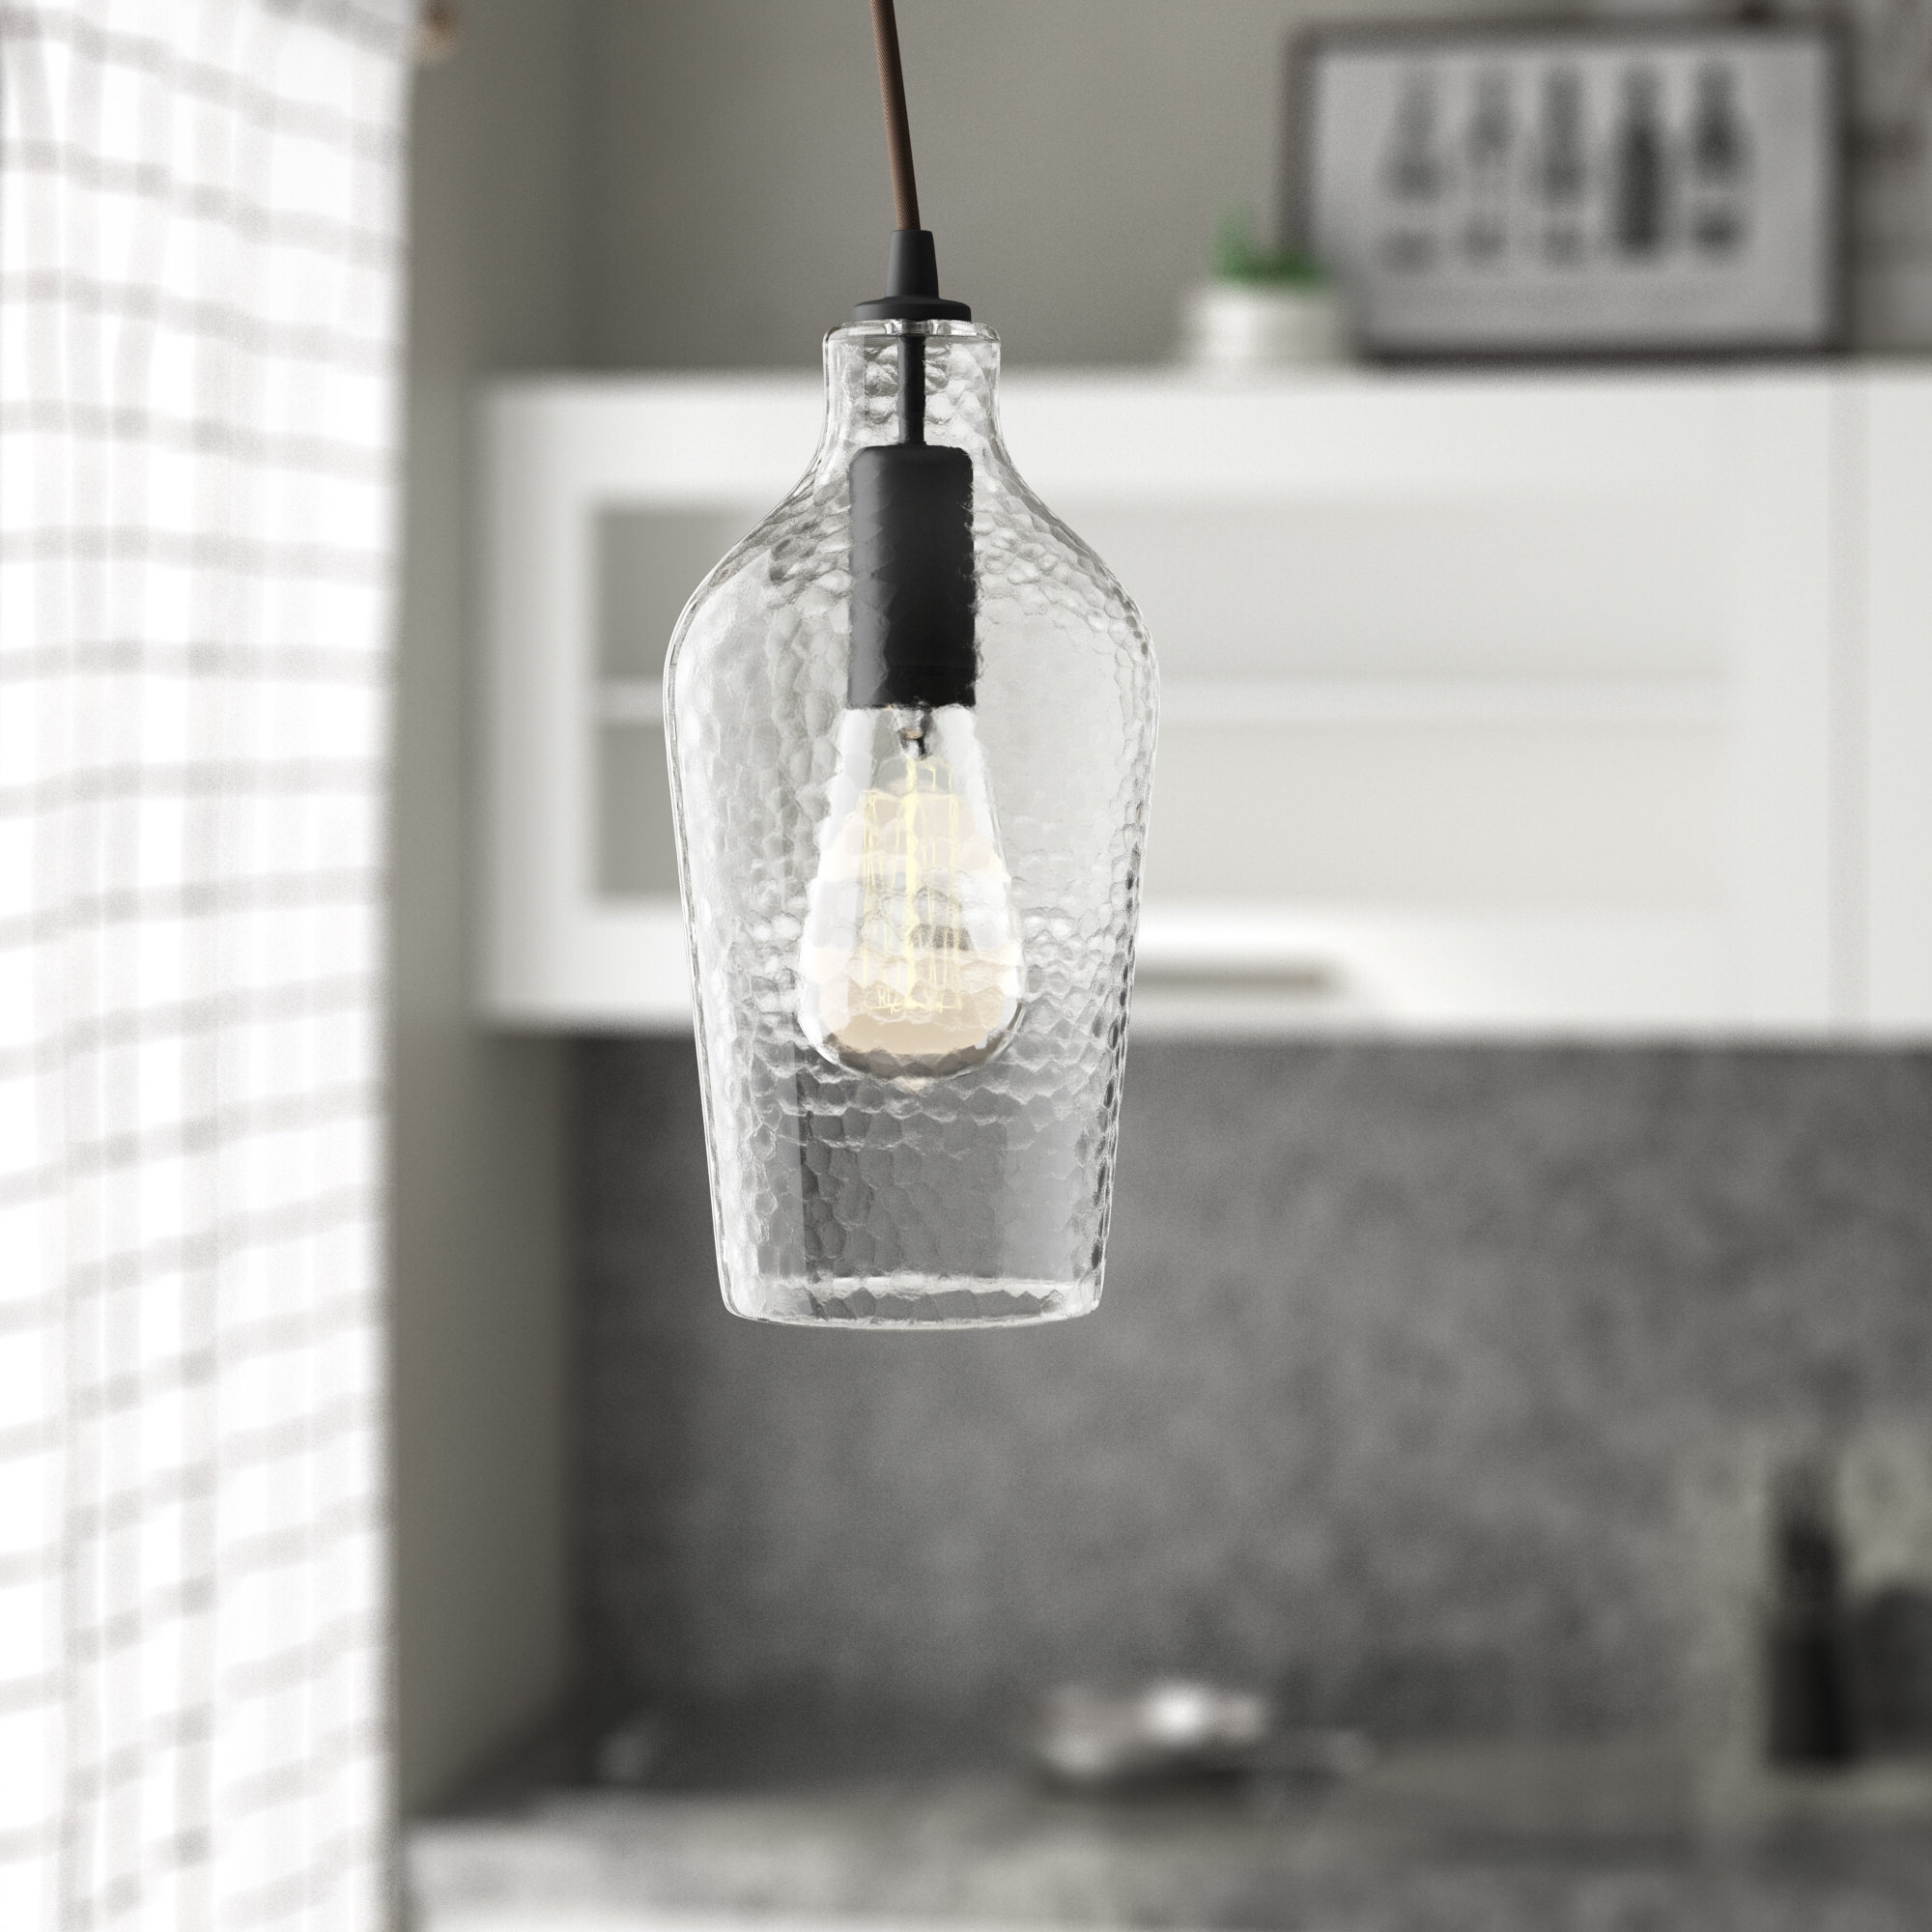 Erico 1 Light Single Bell Pendants With Most Popular 1 Light Single Jar Pendant (Gallery 21 of 25)